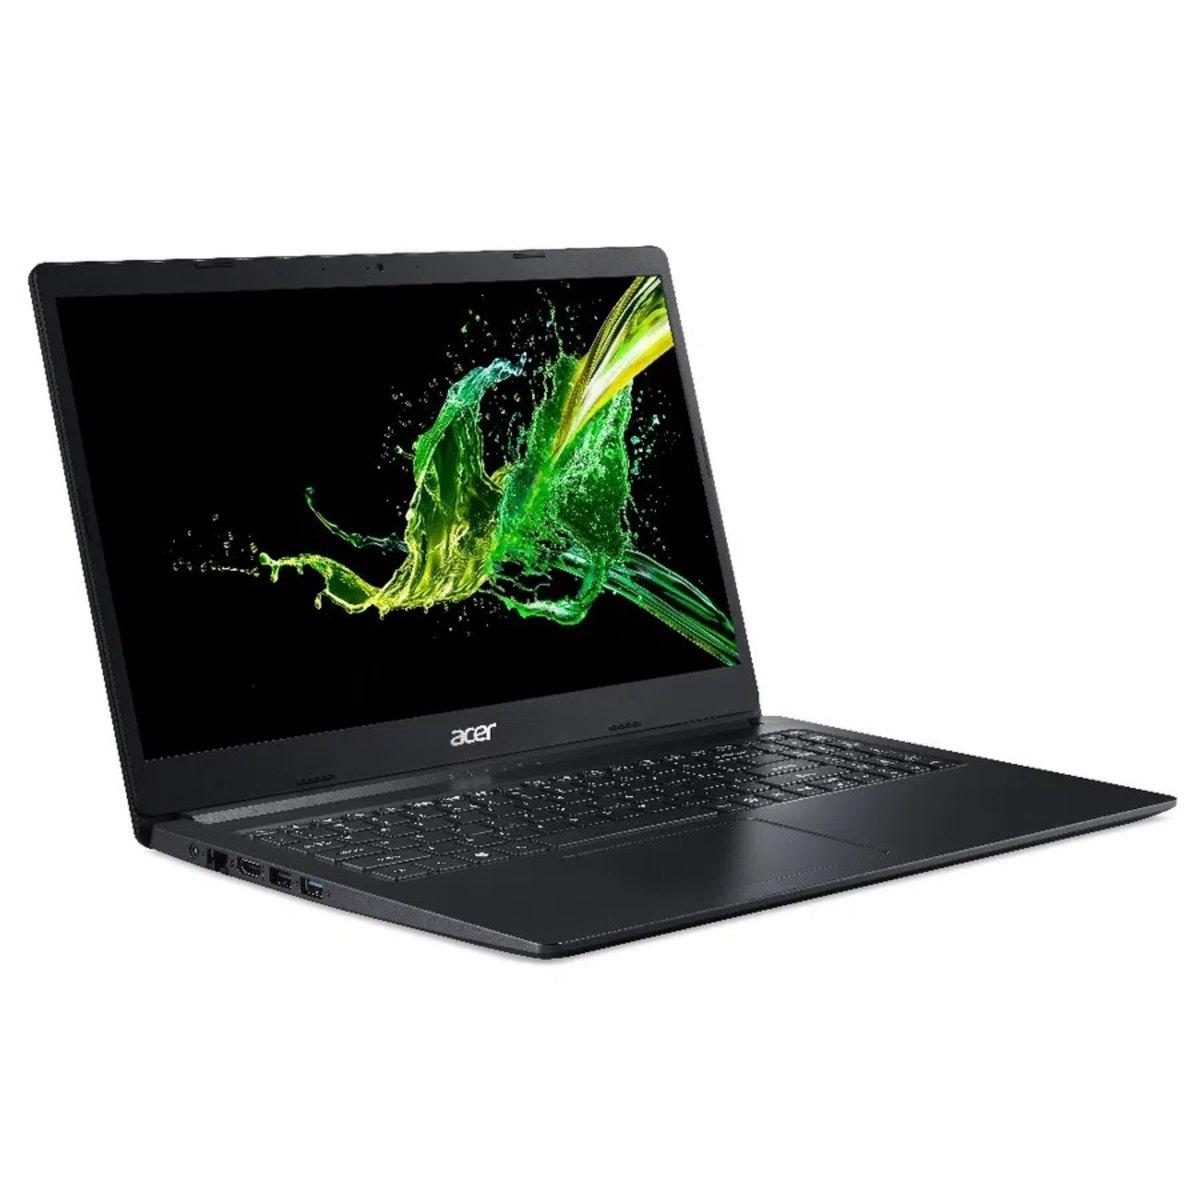 Notebook Acer A315 Intel Celeron N4000 Memoria 8gb Hd 1tb Tela 15.6' Hd Endless Os